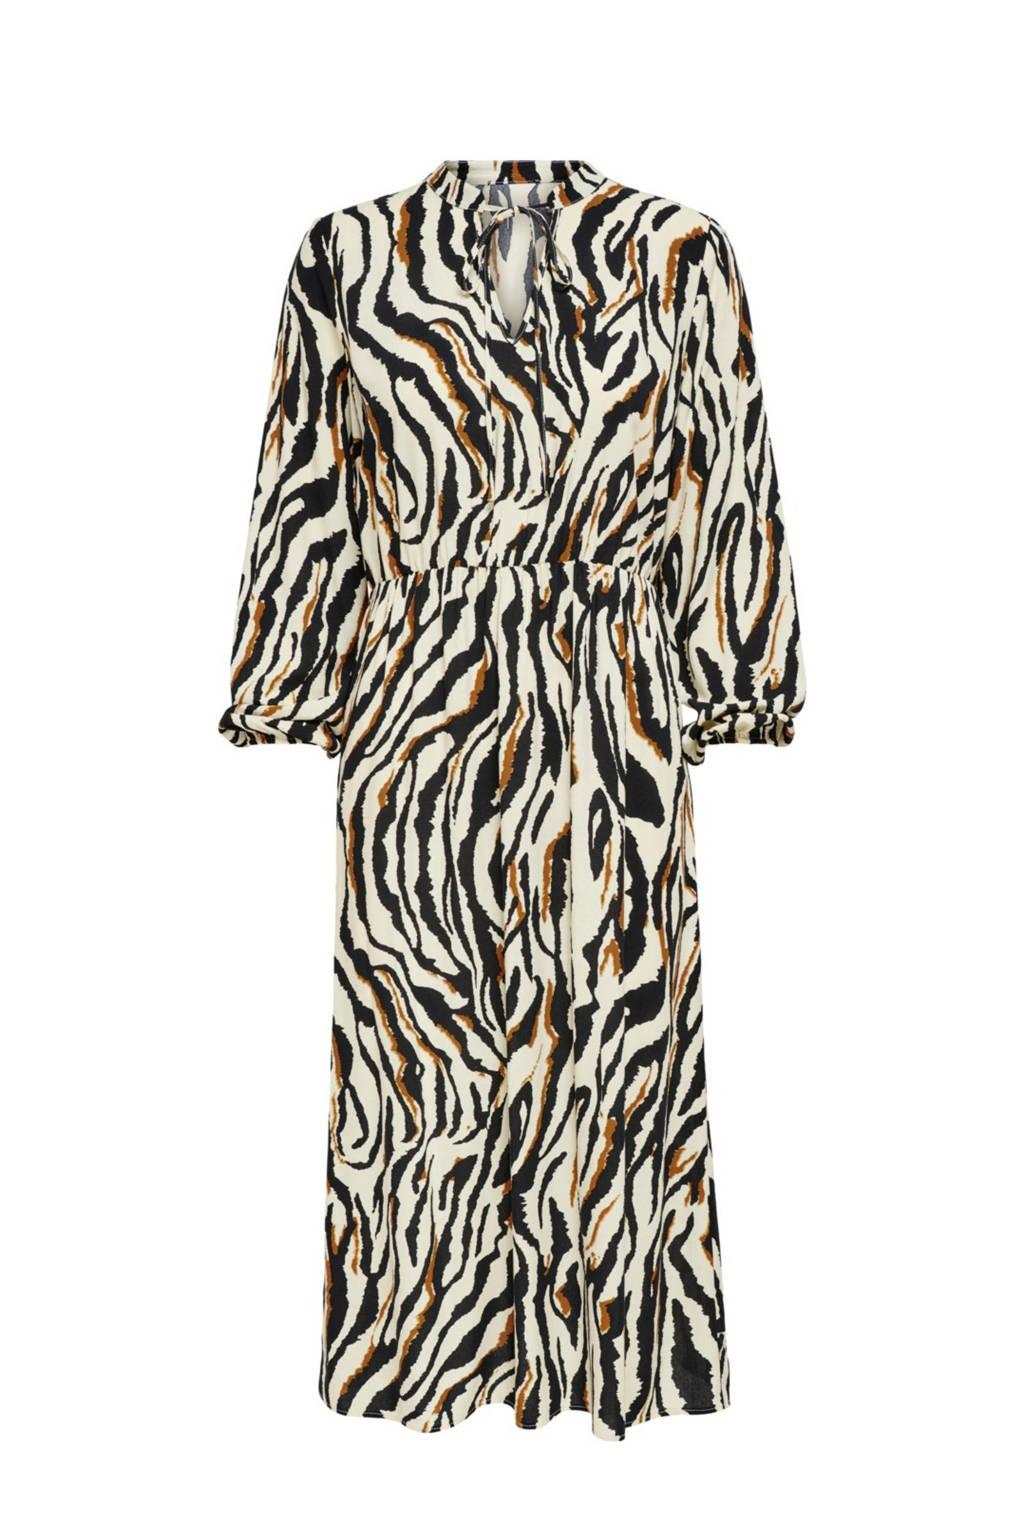 ONLY midi jurk ONLGAGA met zebraprint zwart/wit, Zwart/wit